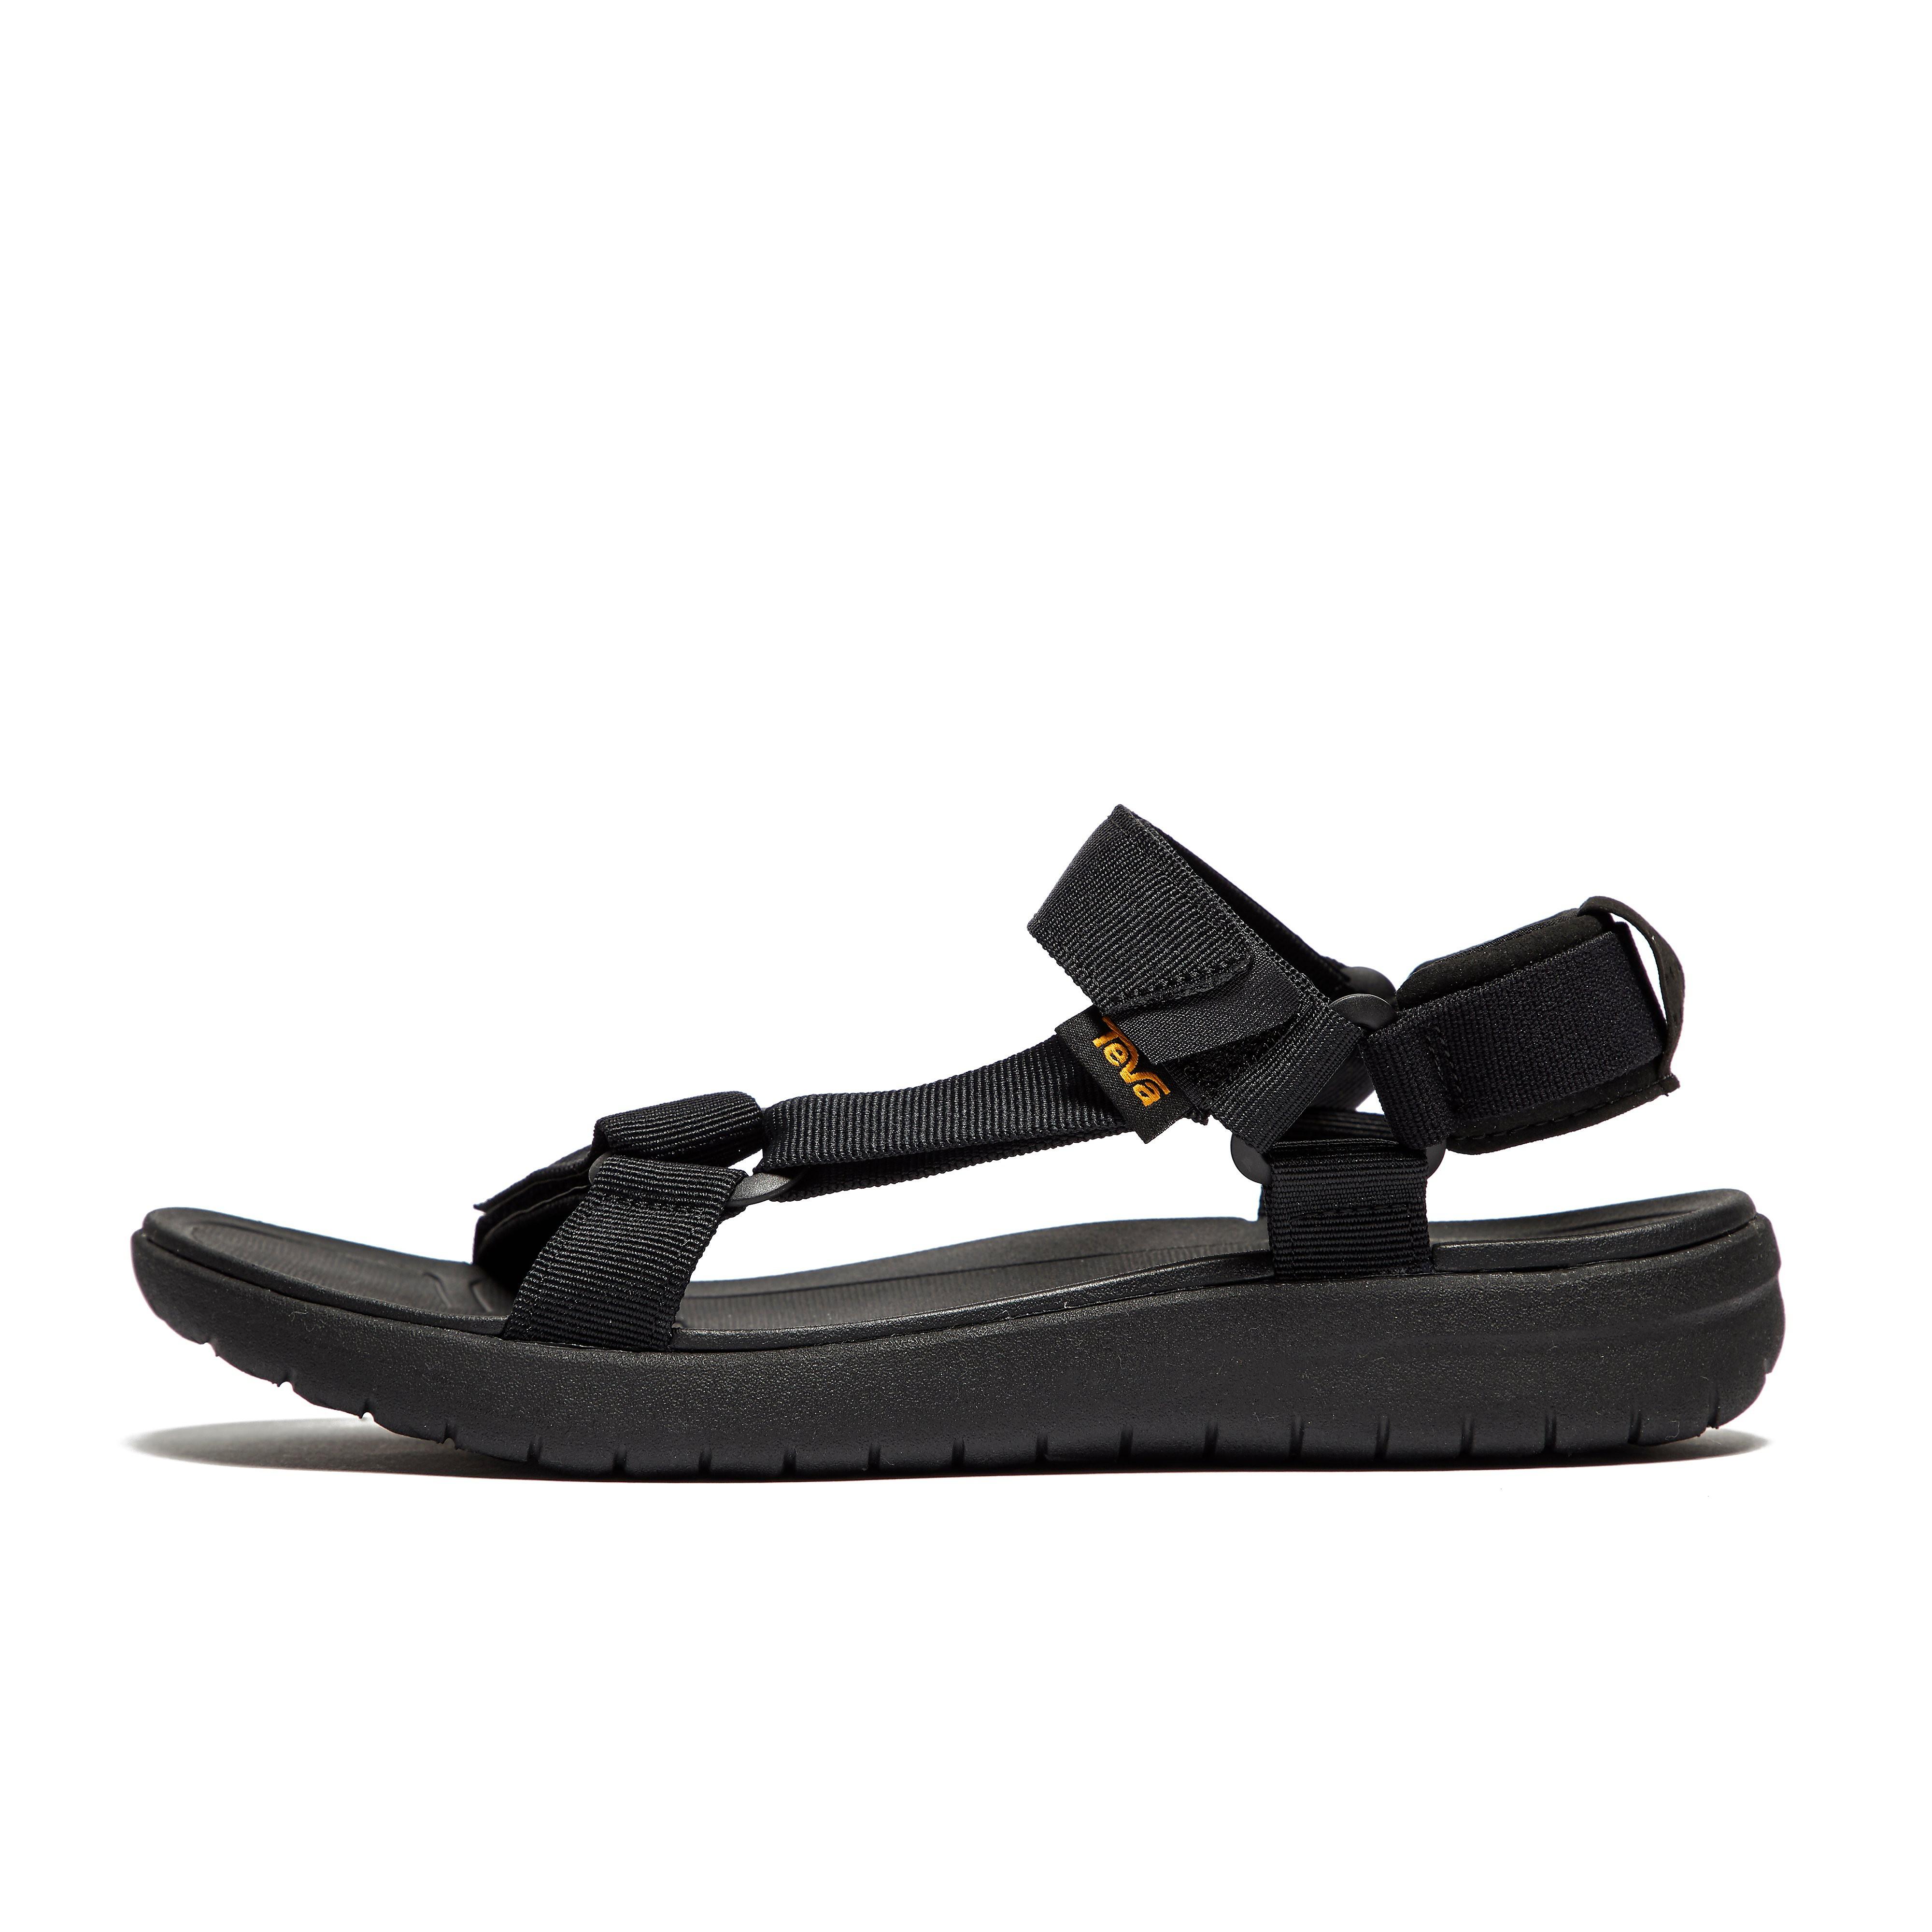 Teva Sanborn Universal Men's Walking Sandals